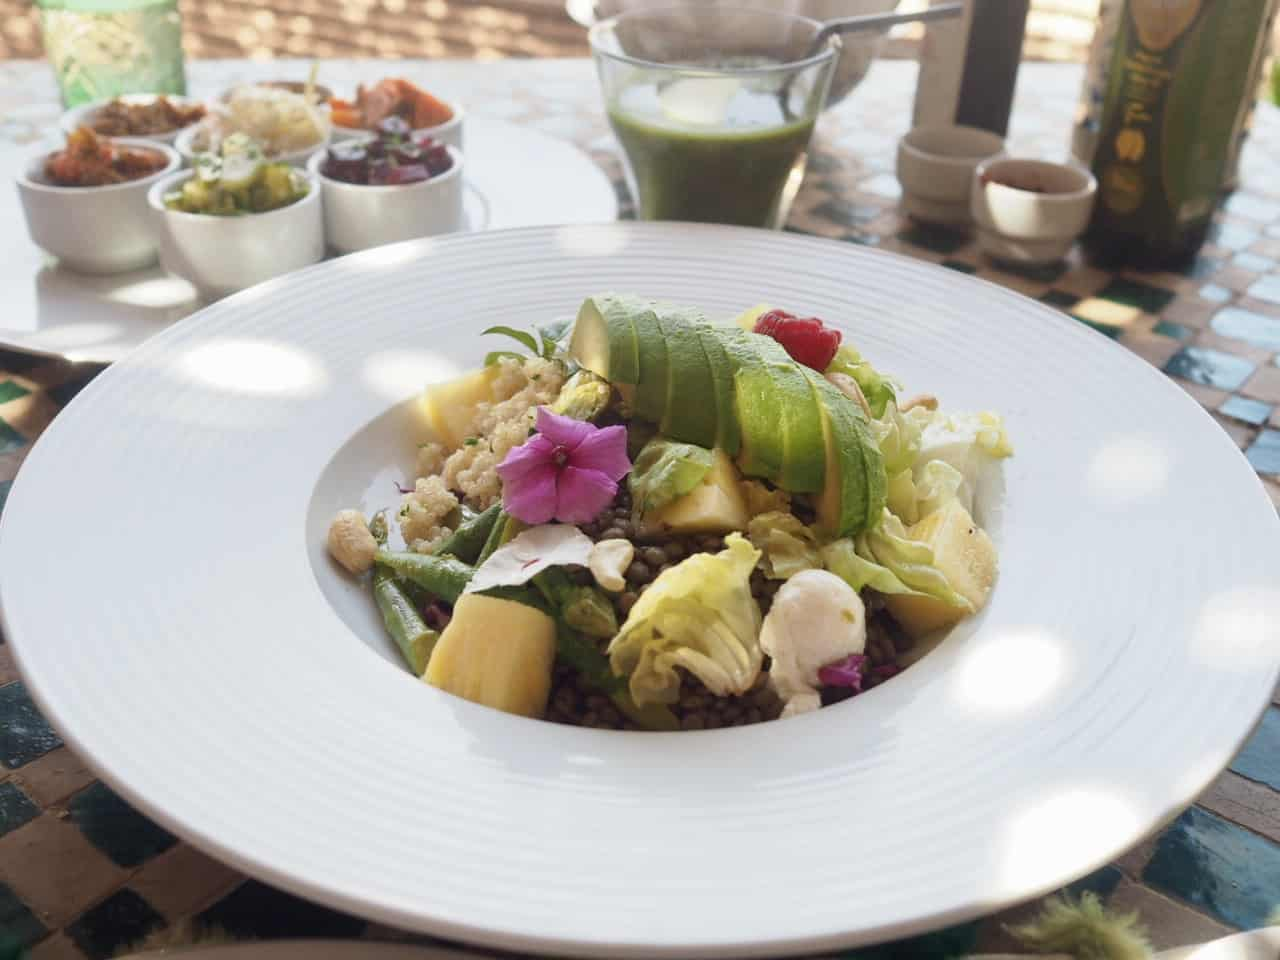 Lunch at La Sultana Hotel Marrakech